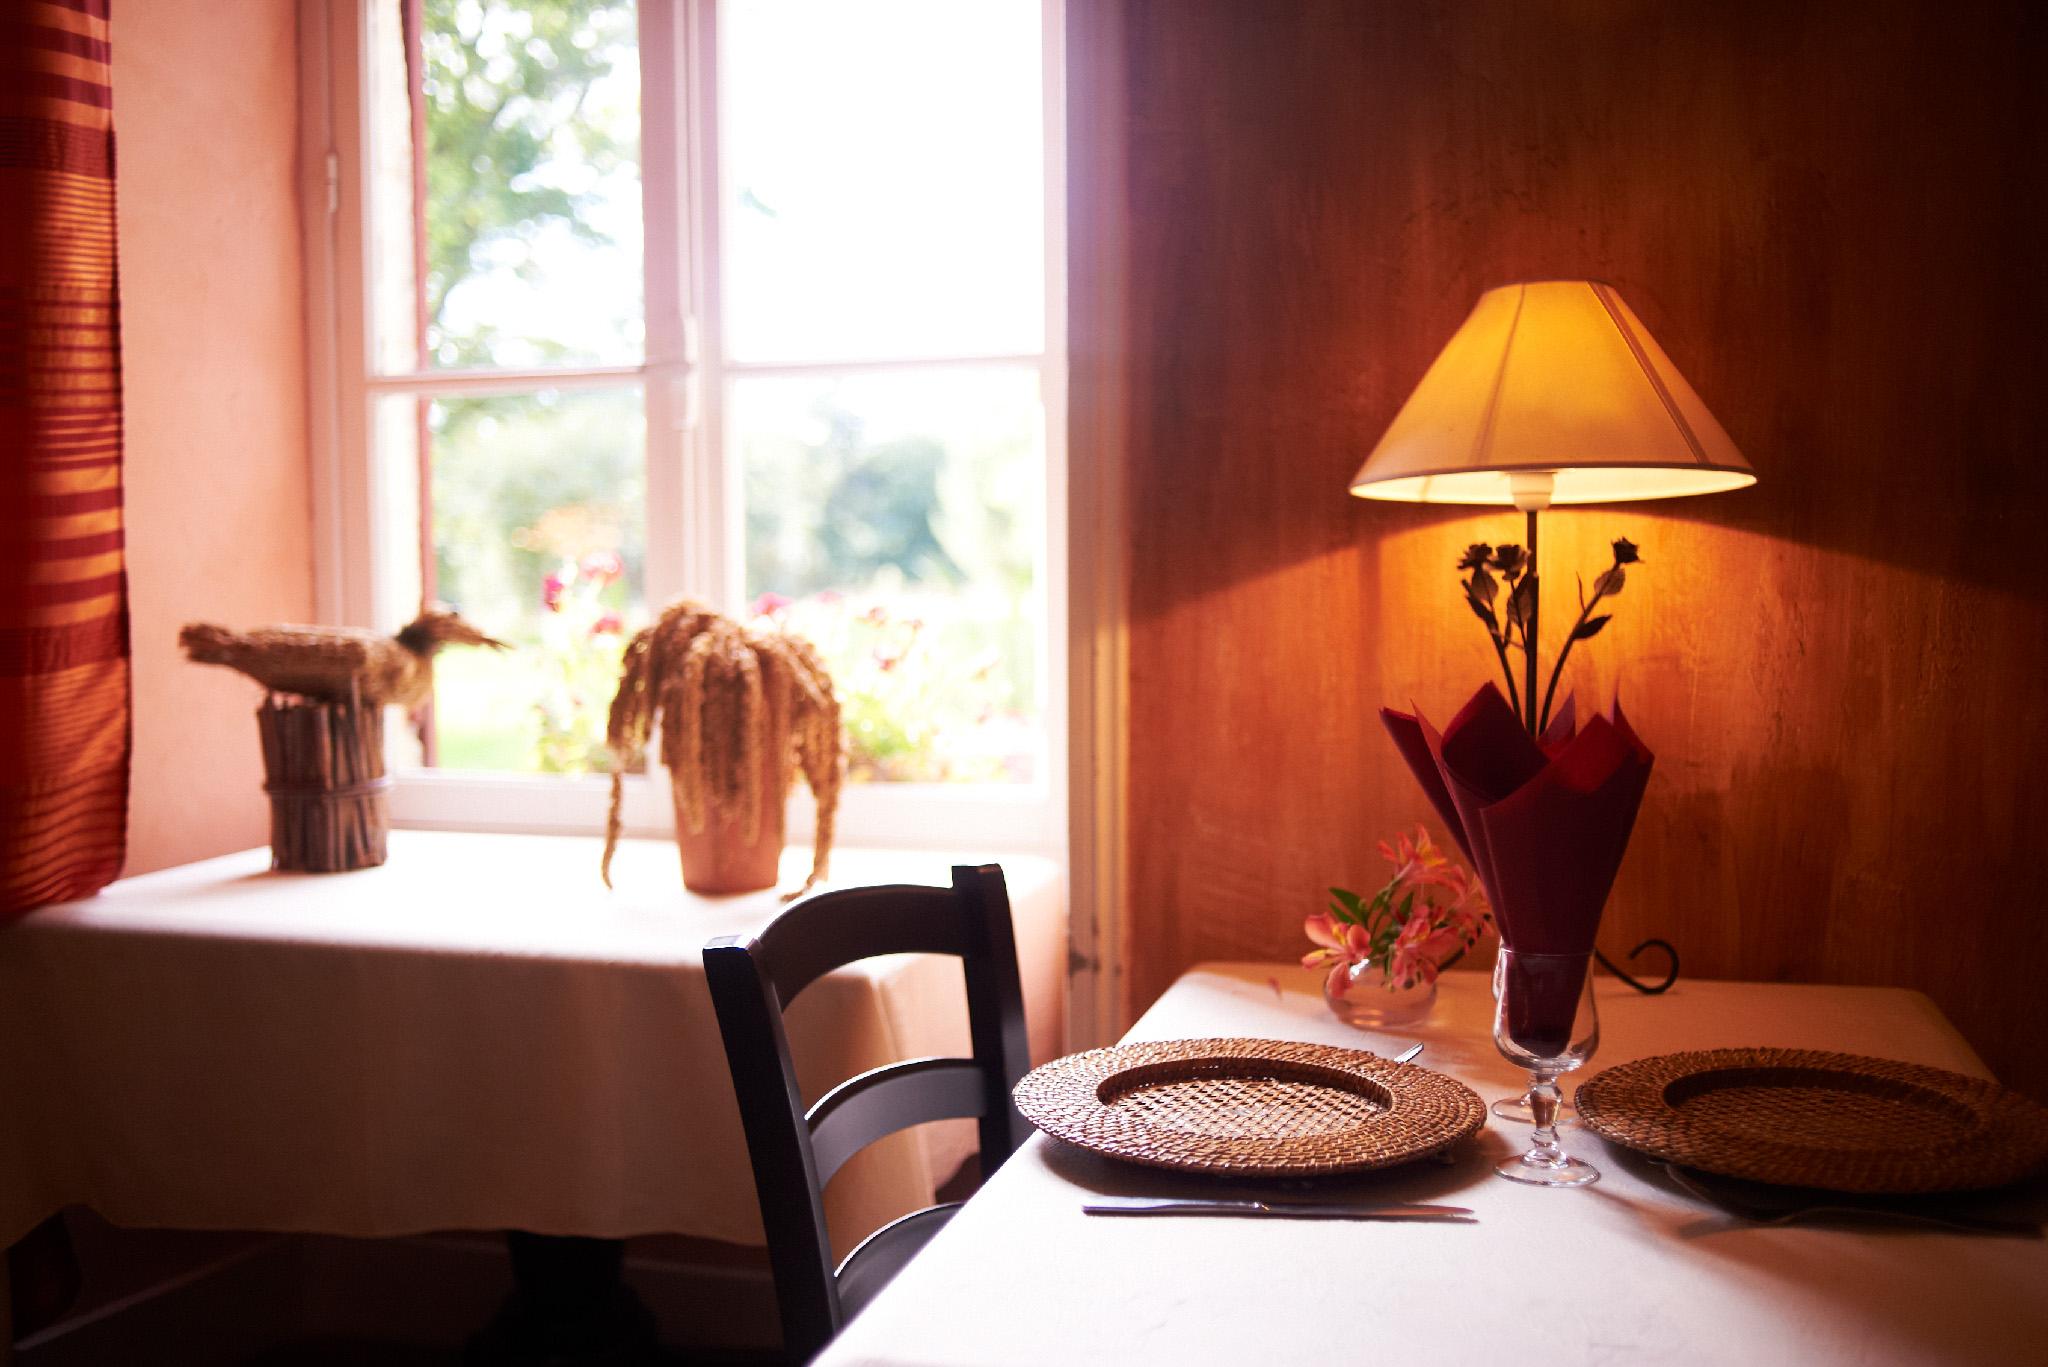 64_photographie_hotel_restaurant_nantes